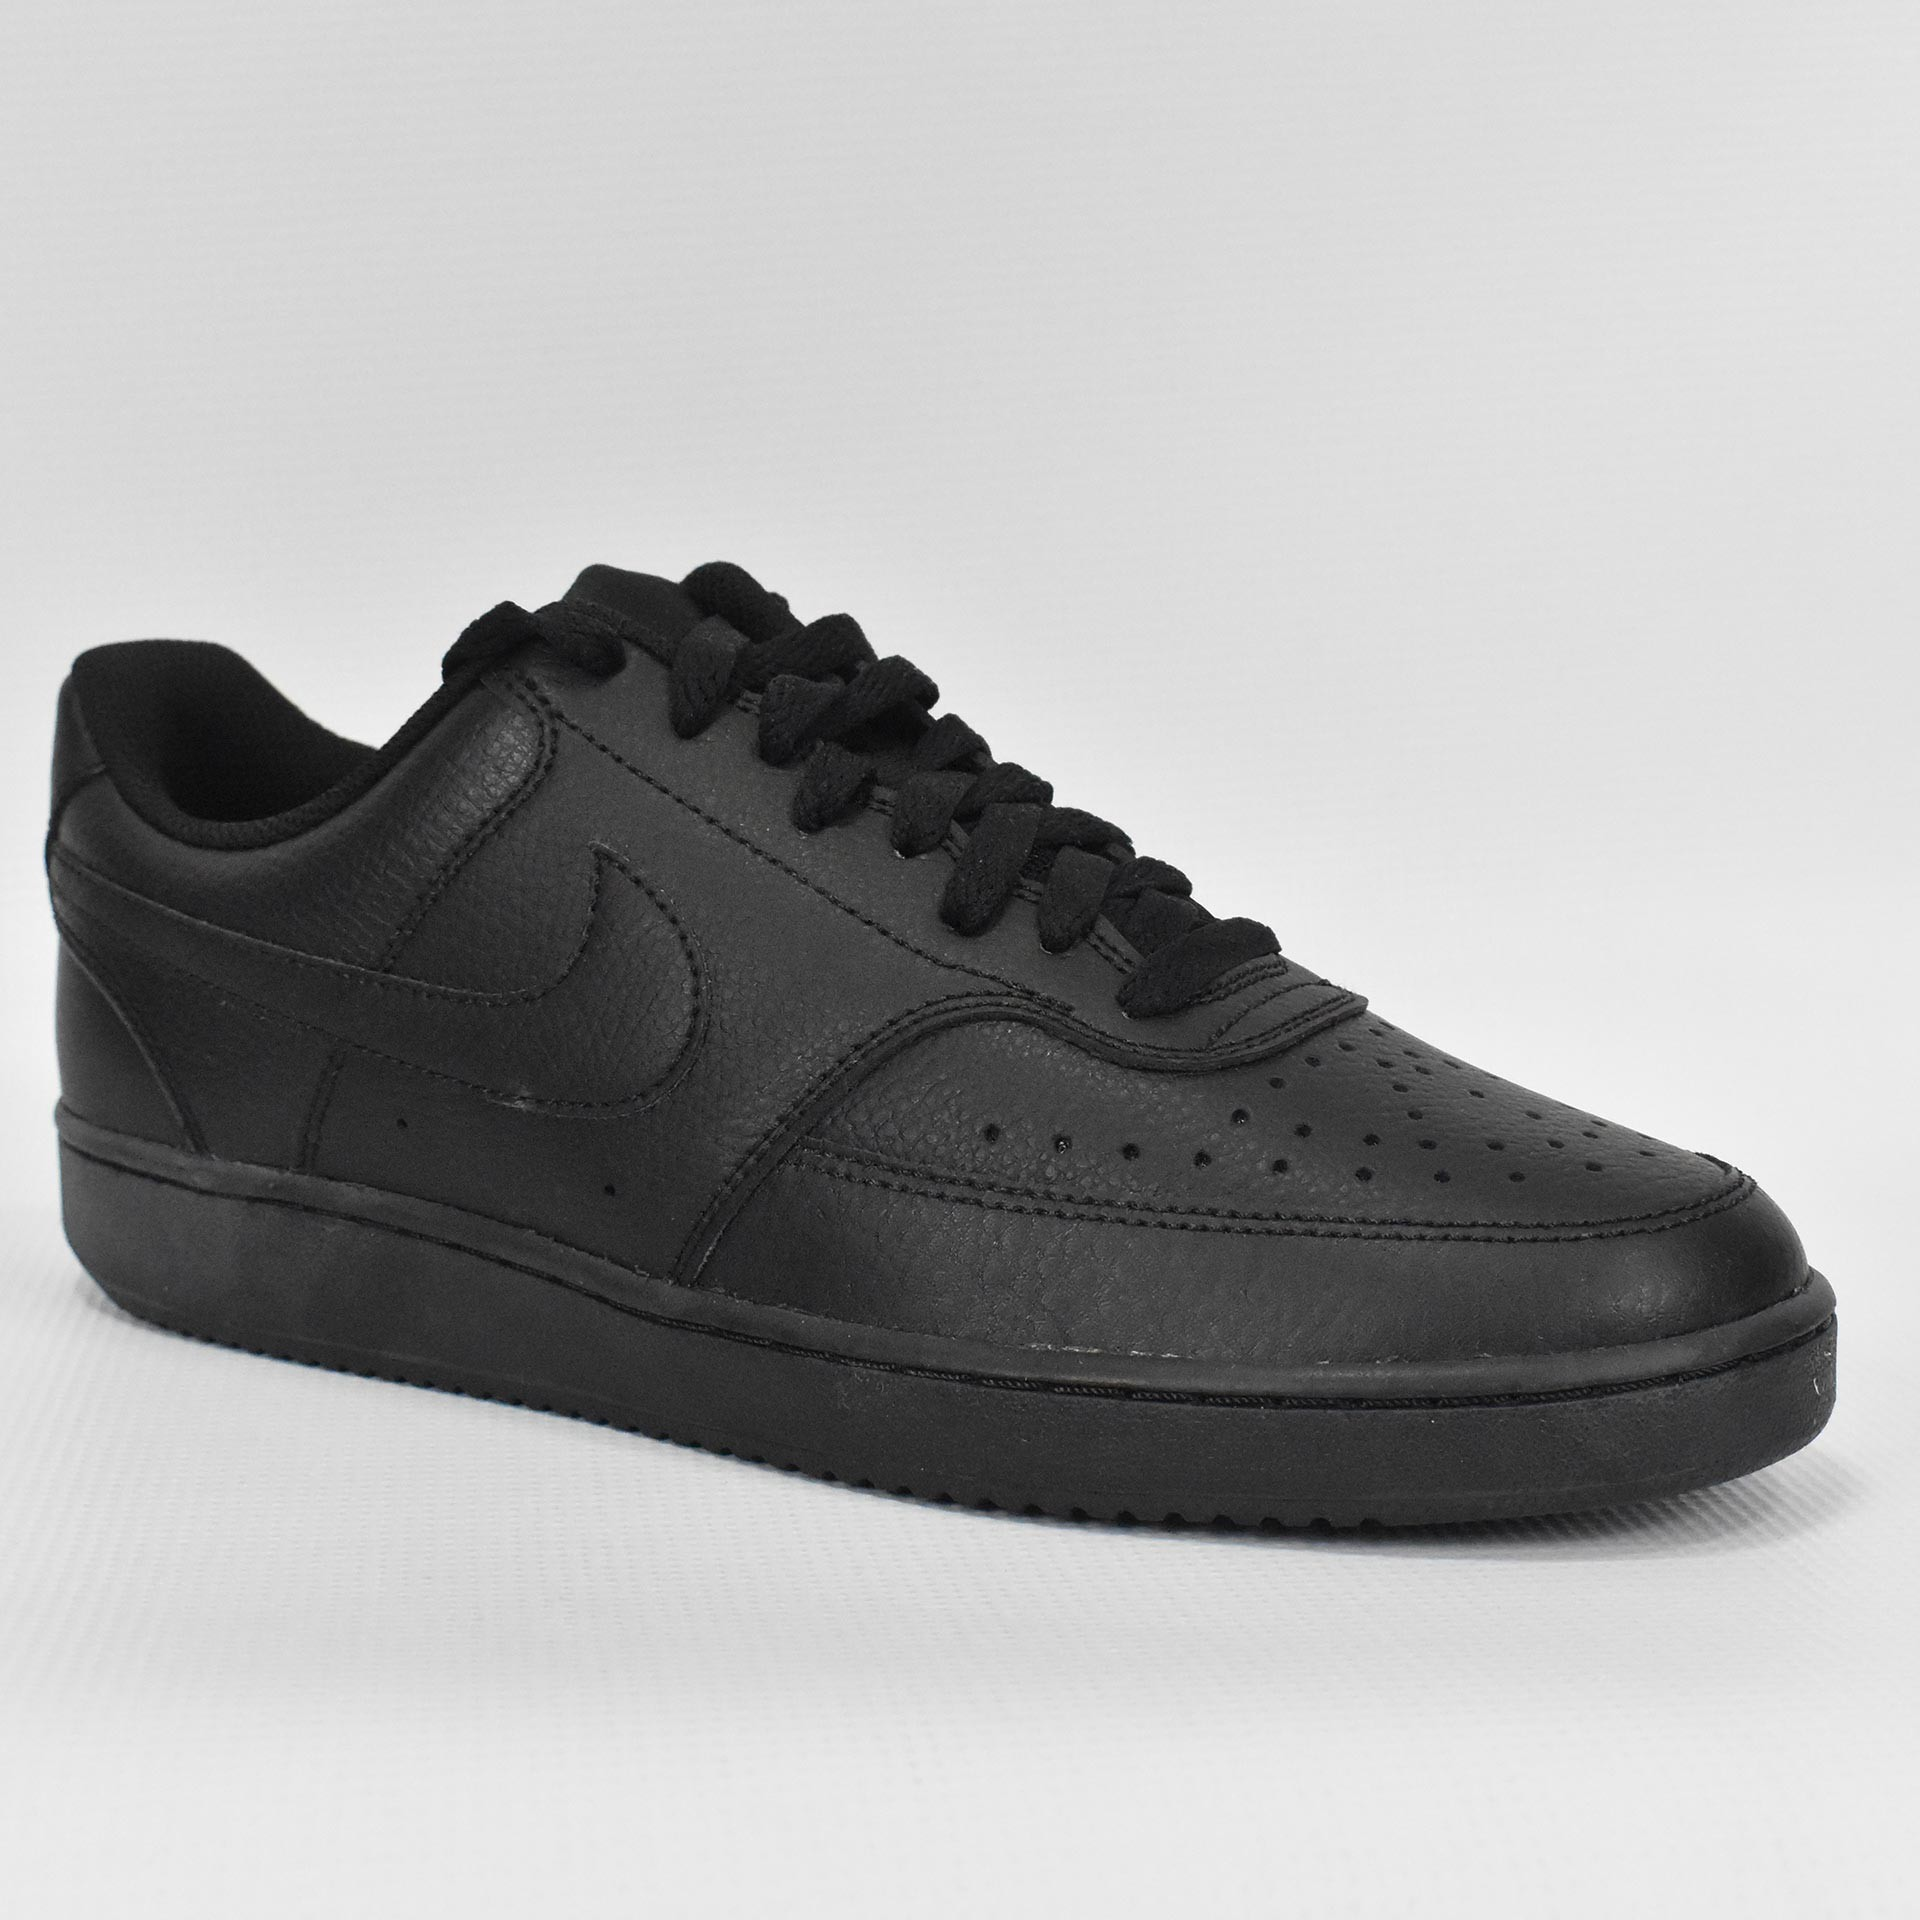 Buty męskie Nike Court Vision LO - CD5463 002